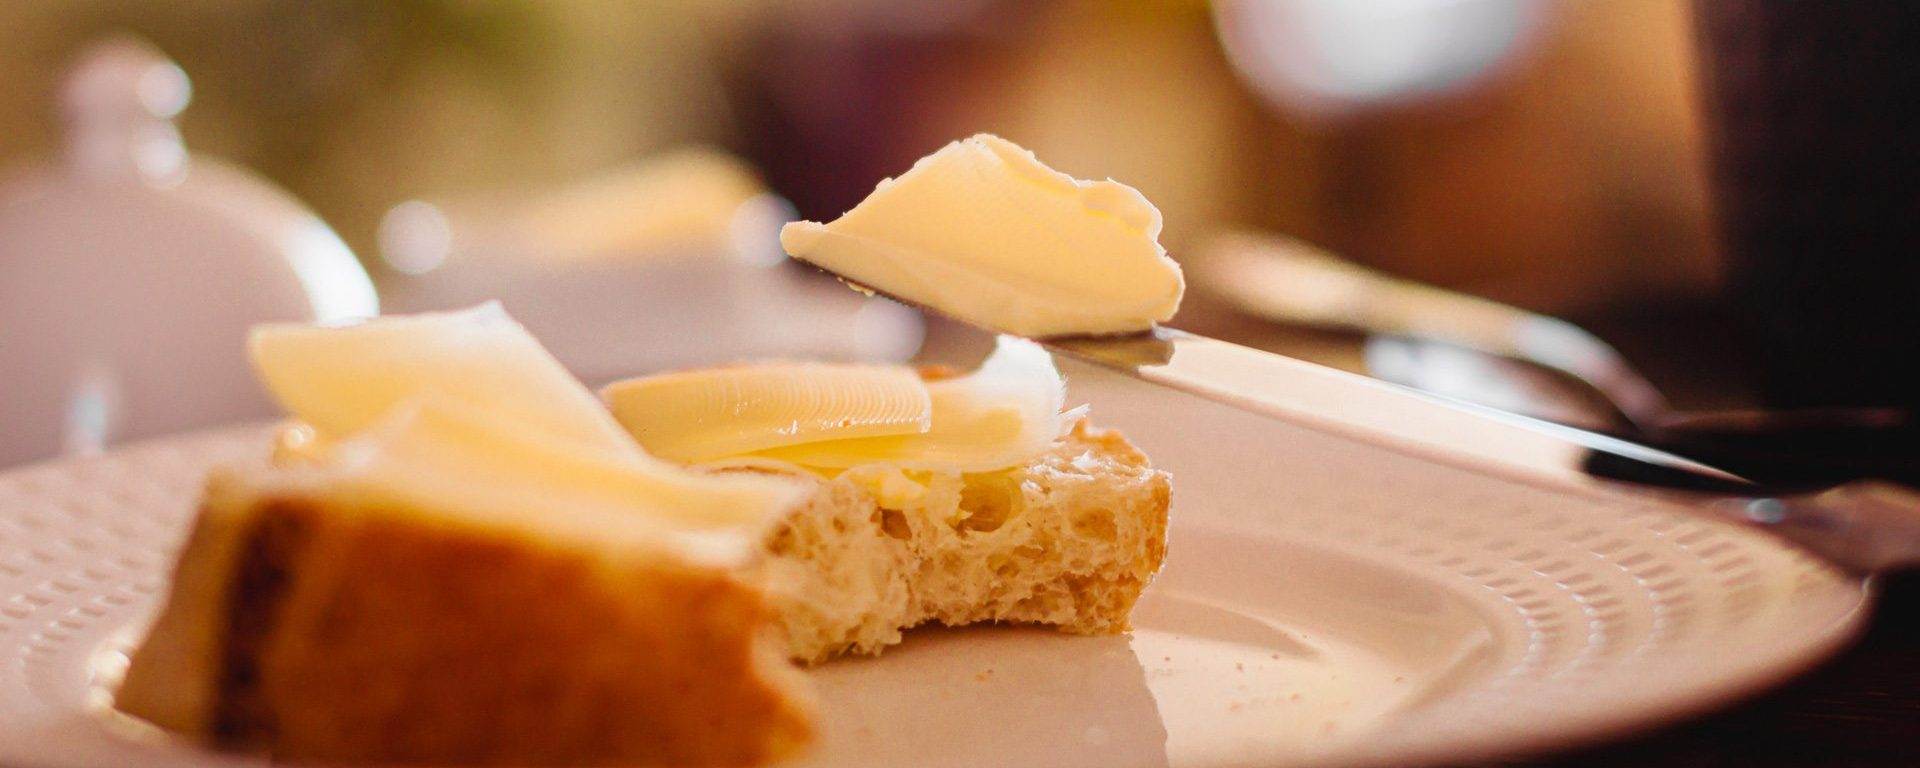 beurre-tartine-couteaulocrifa-pixabay-aspect-ratio-2000-800